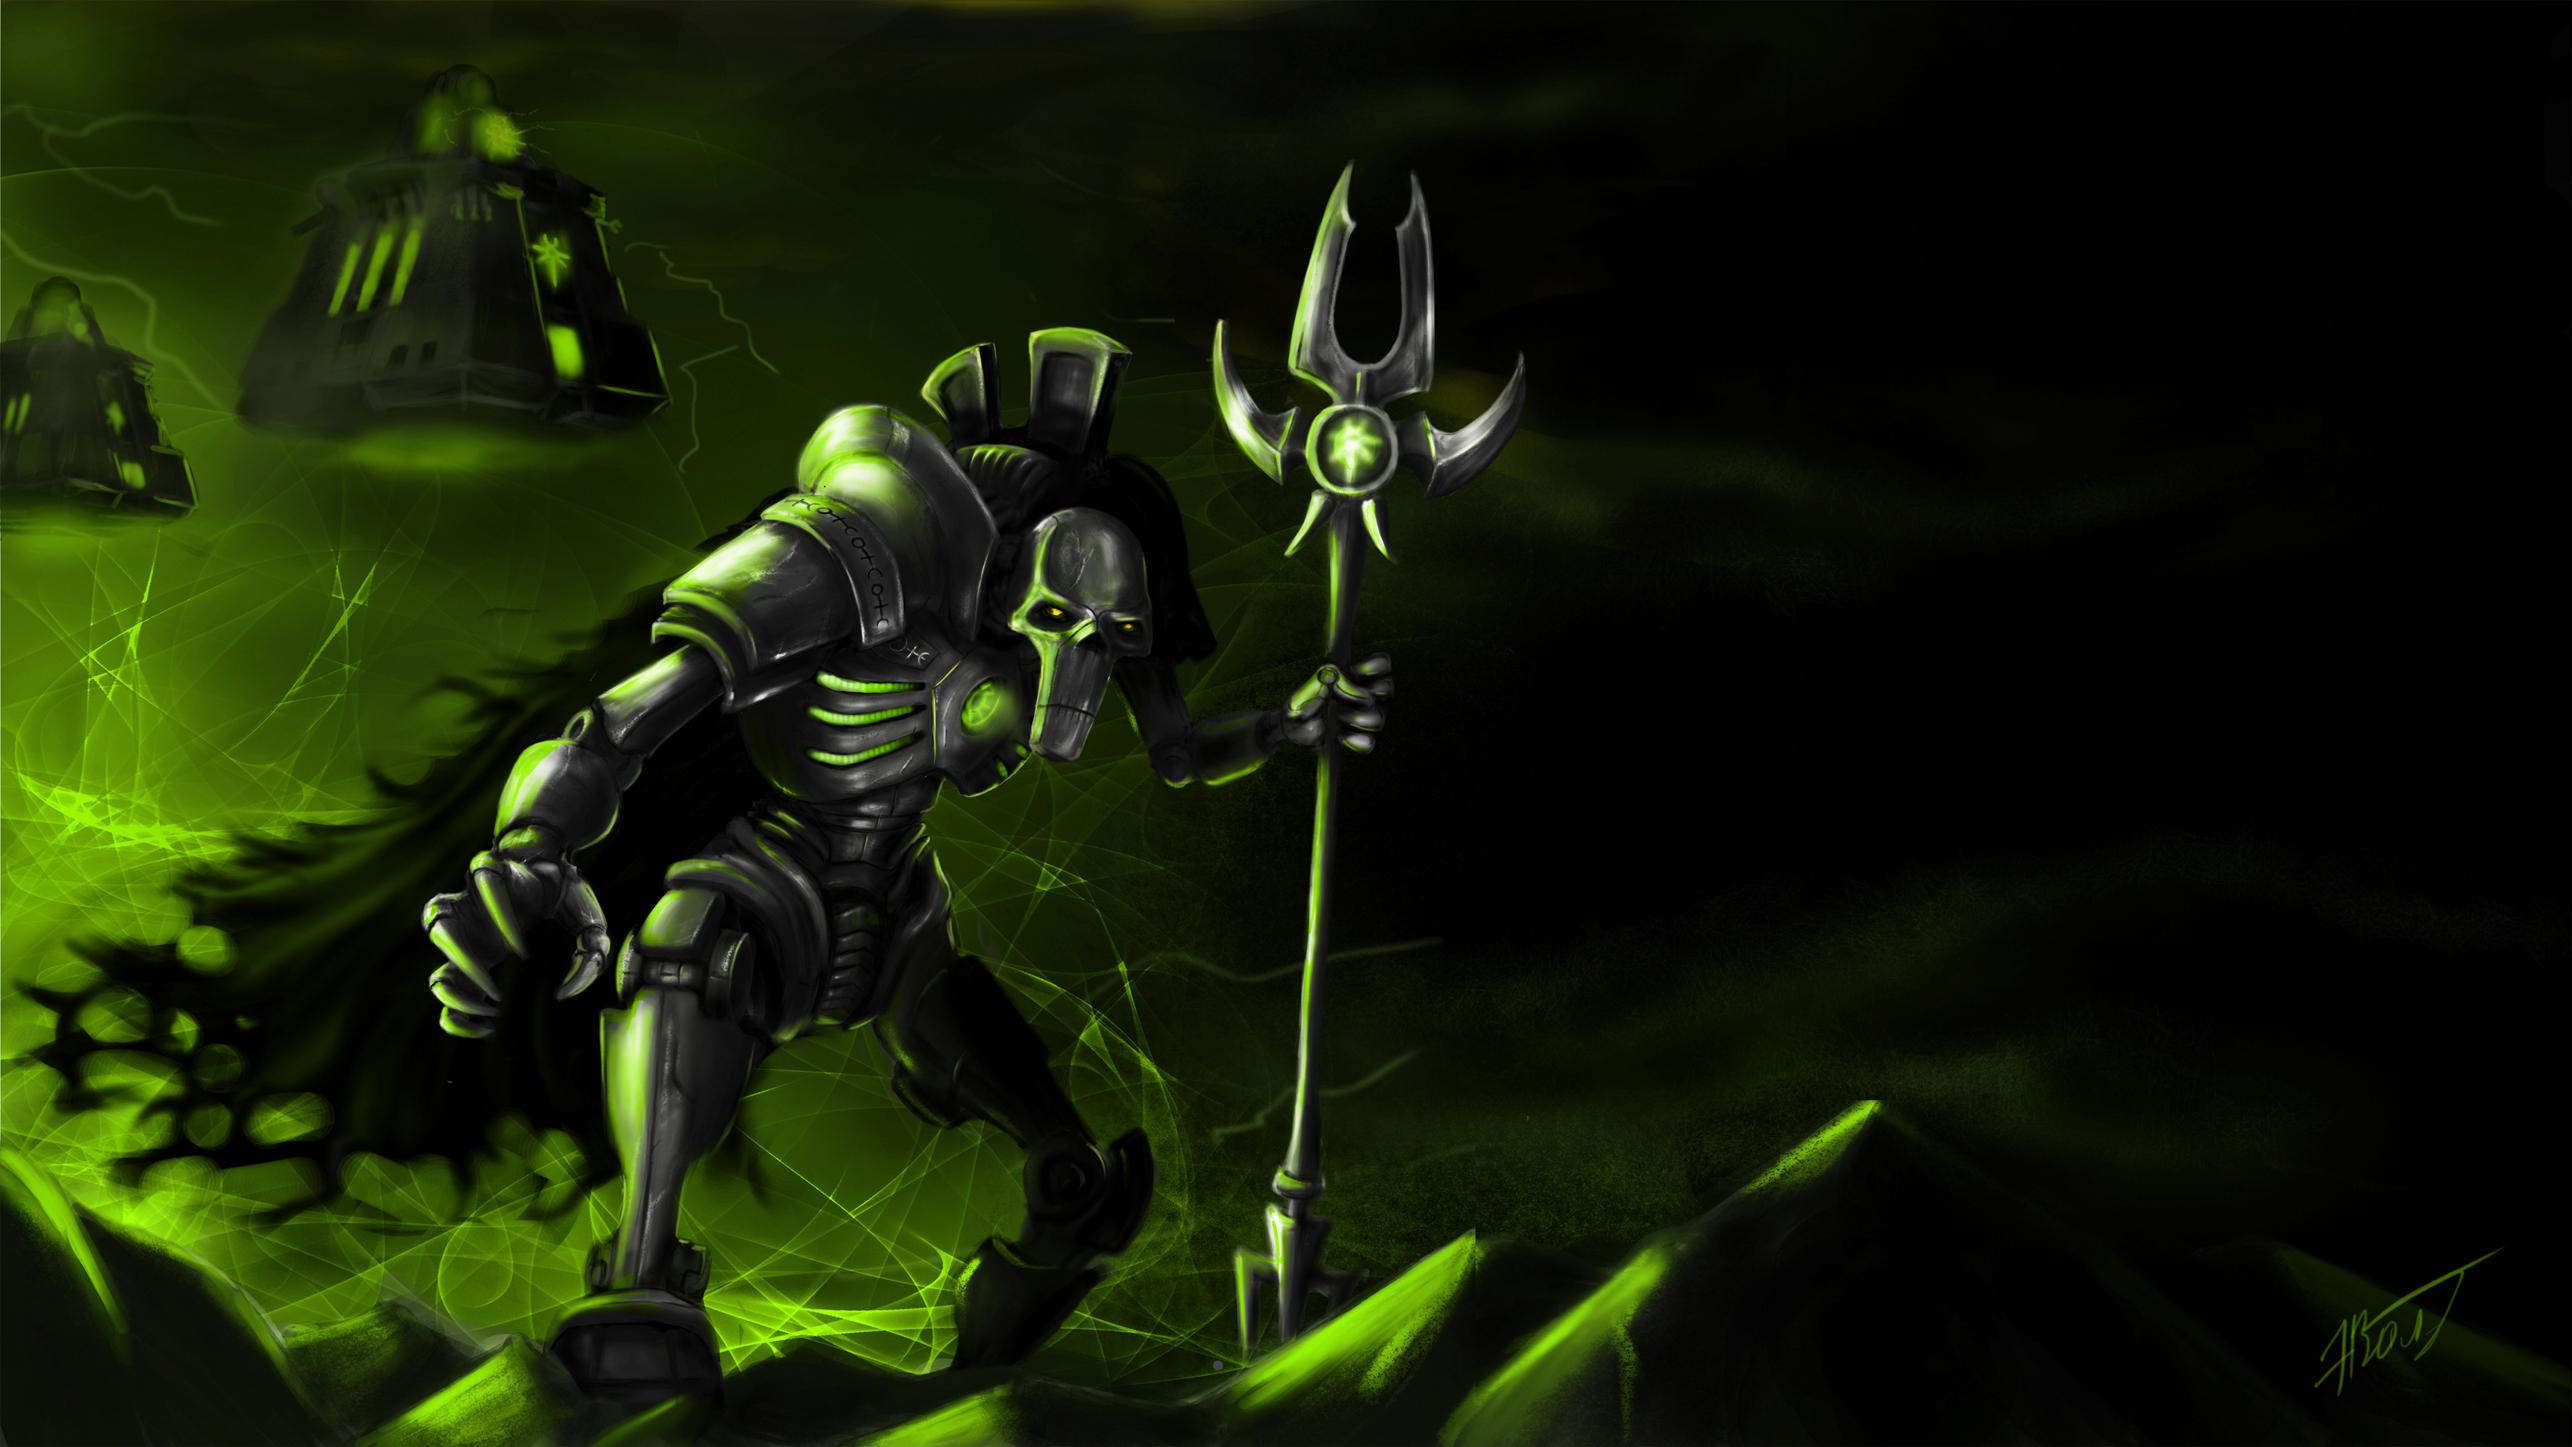 warhammer_40k_necron_lord_by_xecut-d58pr